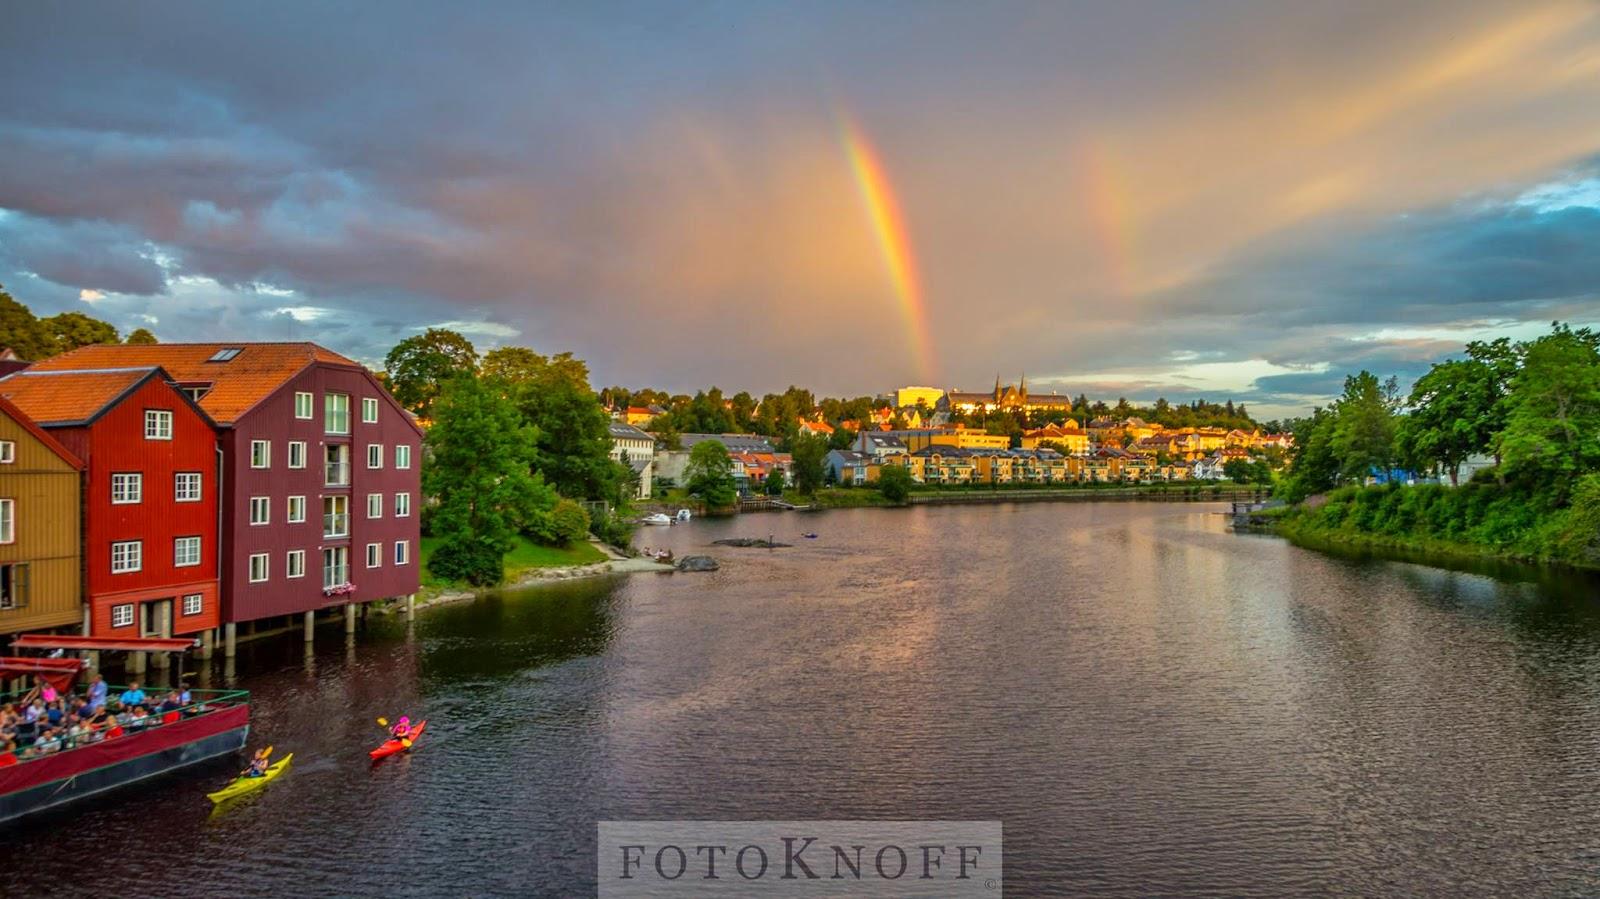 Rainbow - Trondheim, Norway (Photo Sven-Erik Knoff)